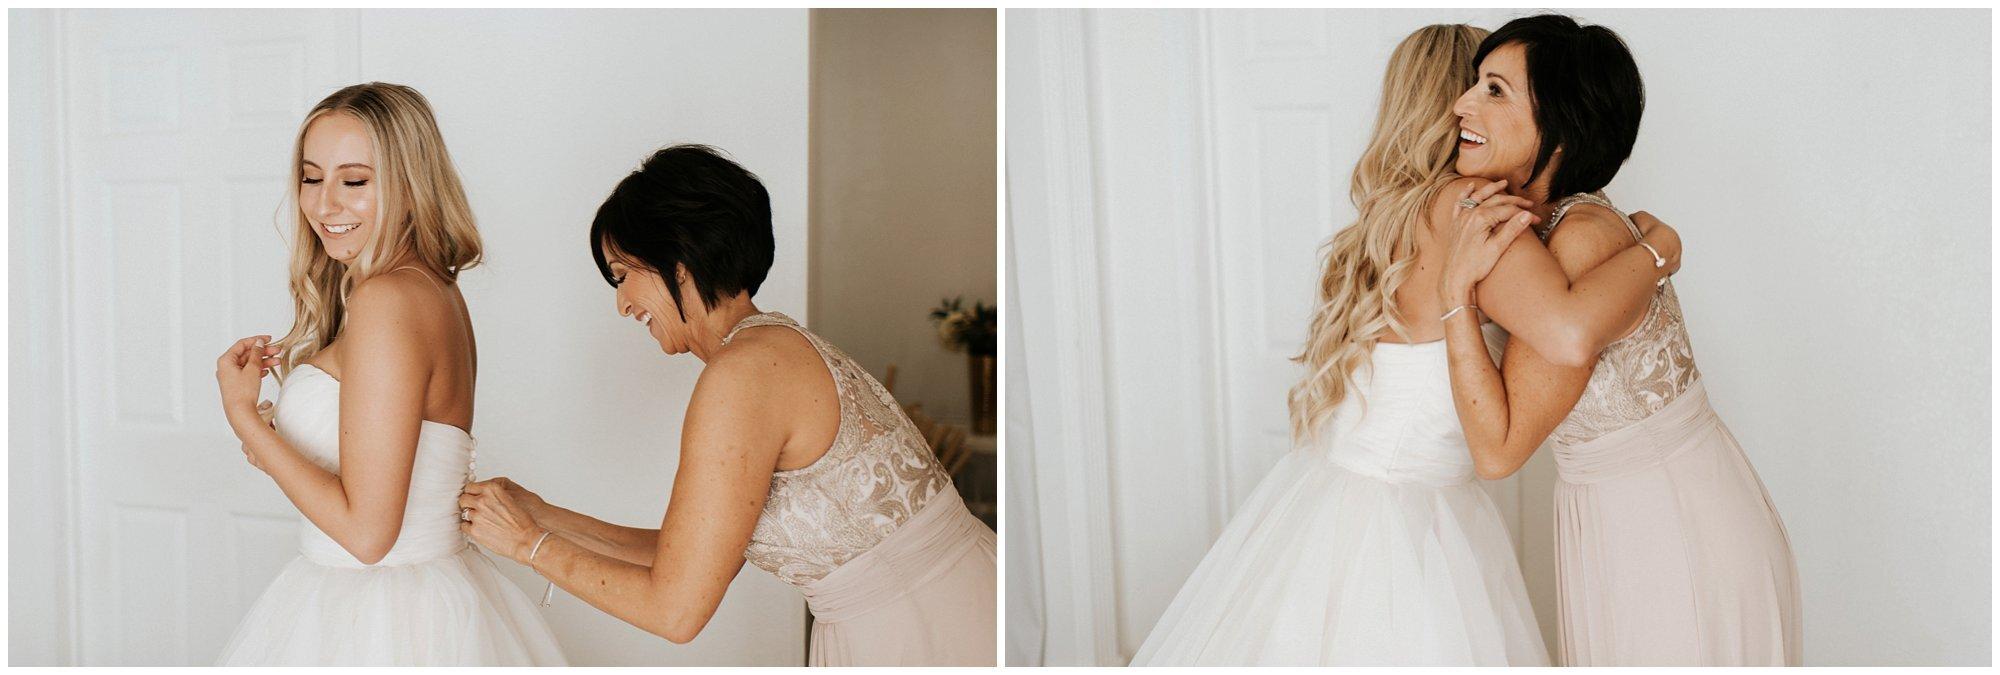 Wedgewood_Lindsay_Groves-Arizona-Wedding-Photographer-M+C_0002.jpg